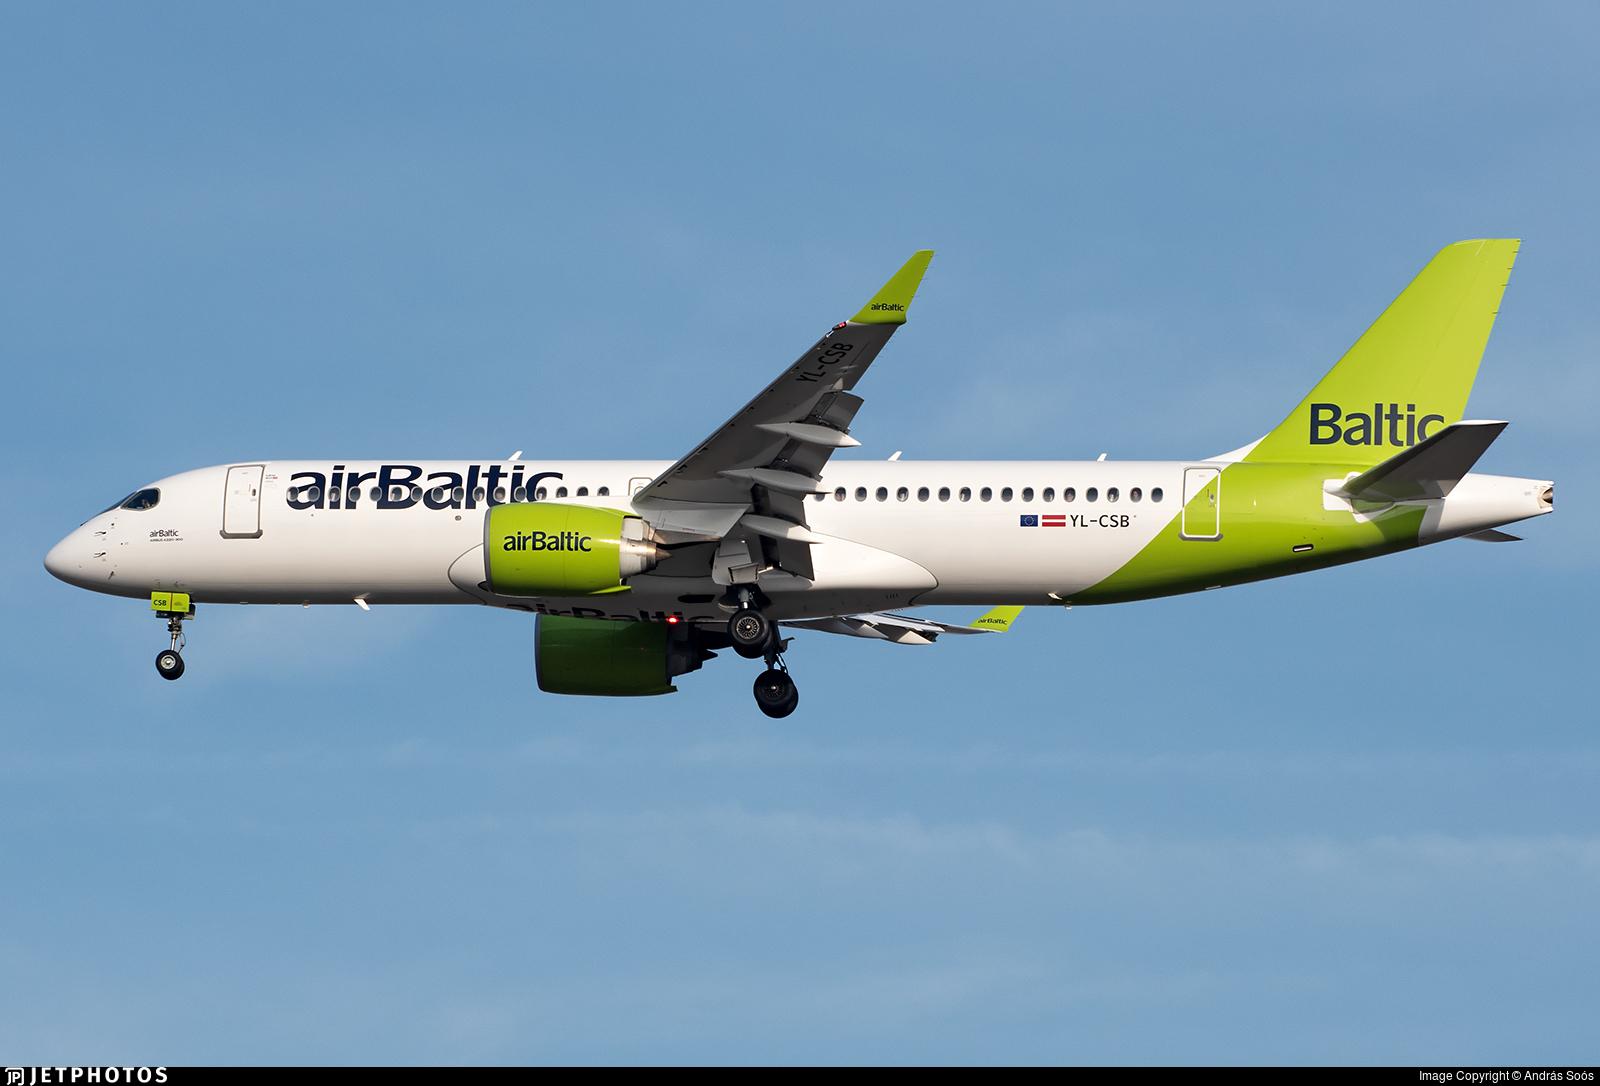 YL-CSB - Bombardier CSeries CS300 - Air Baltic